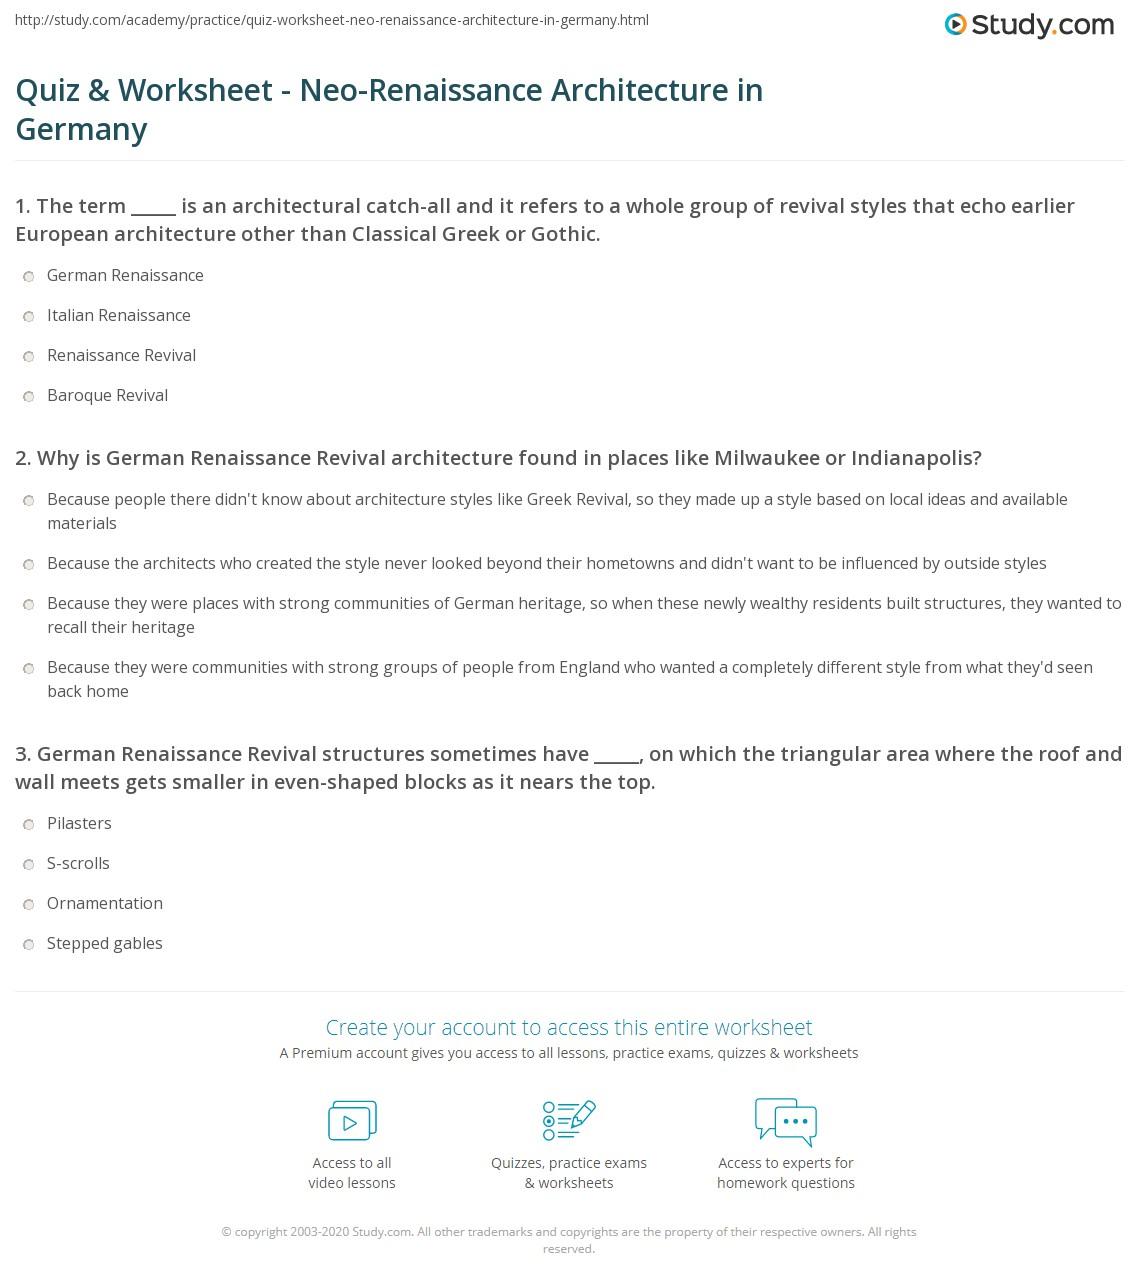 Quiz Worksheet Neo Renaissance Architecture In Germany